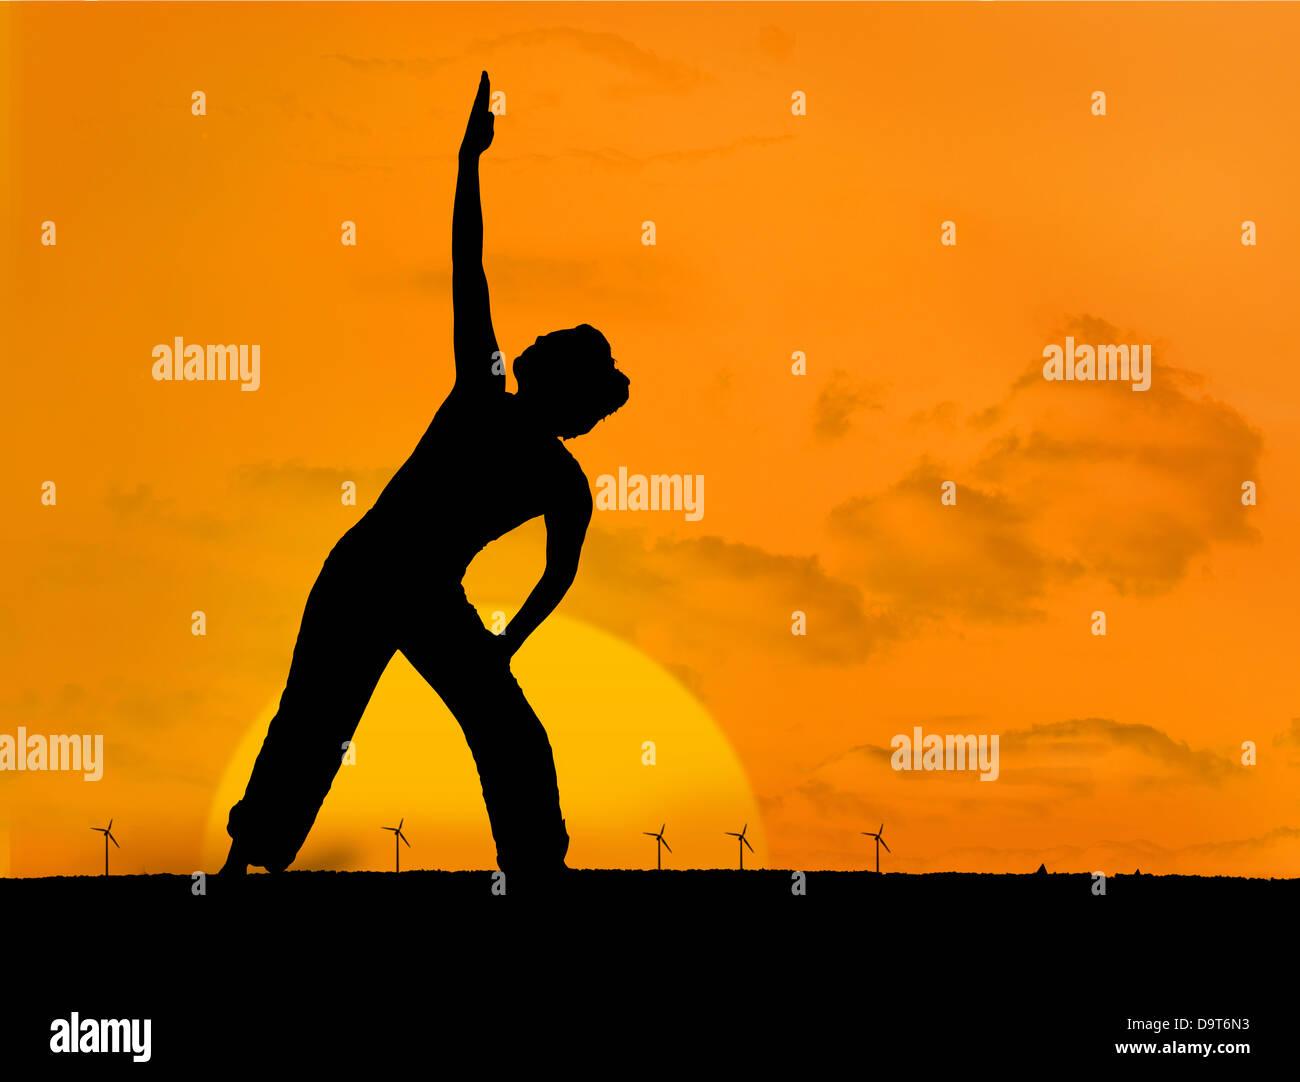 Calm silhouette of woman doing yoga Photo Stock